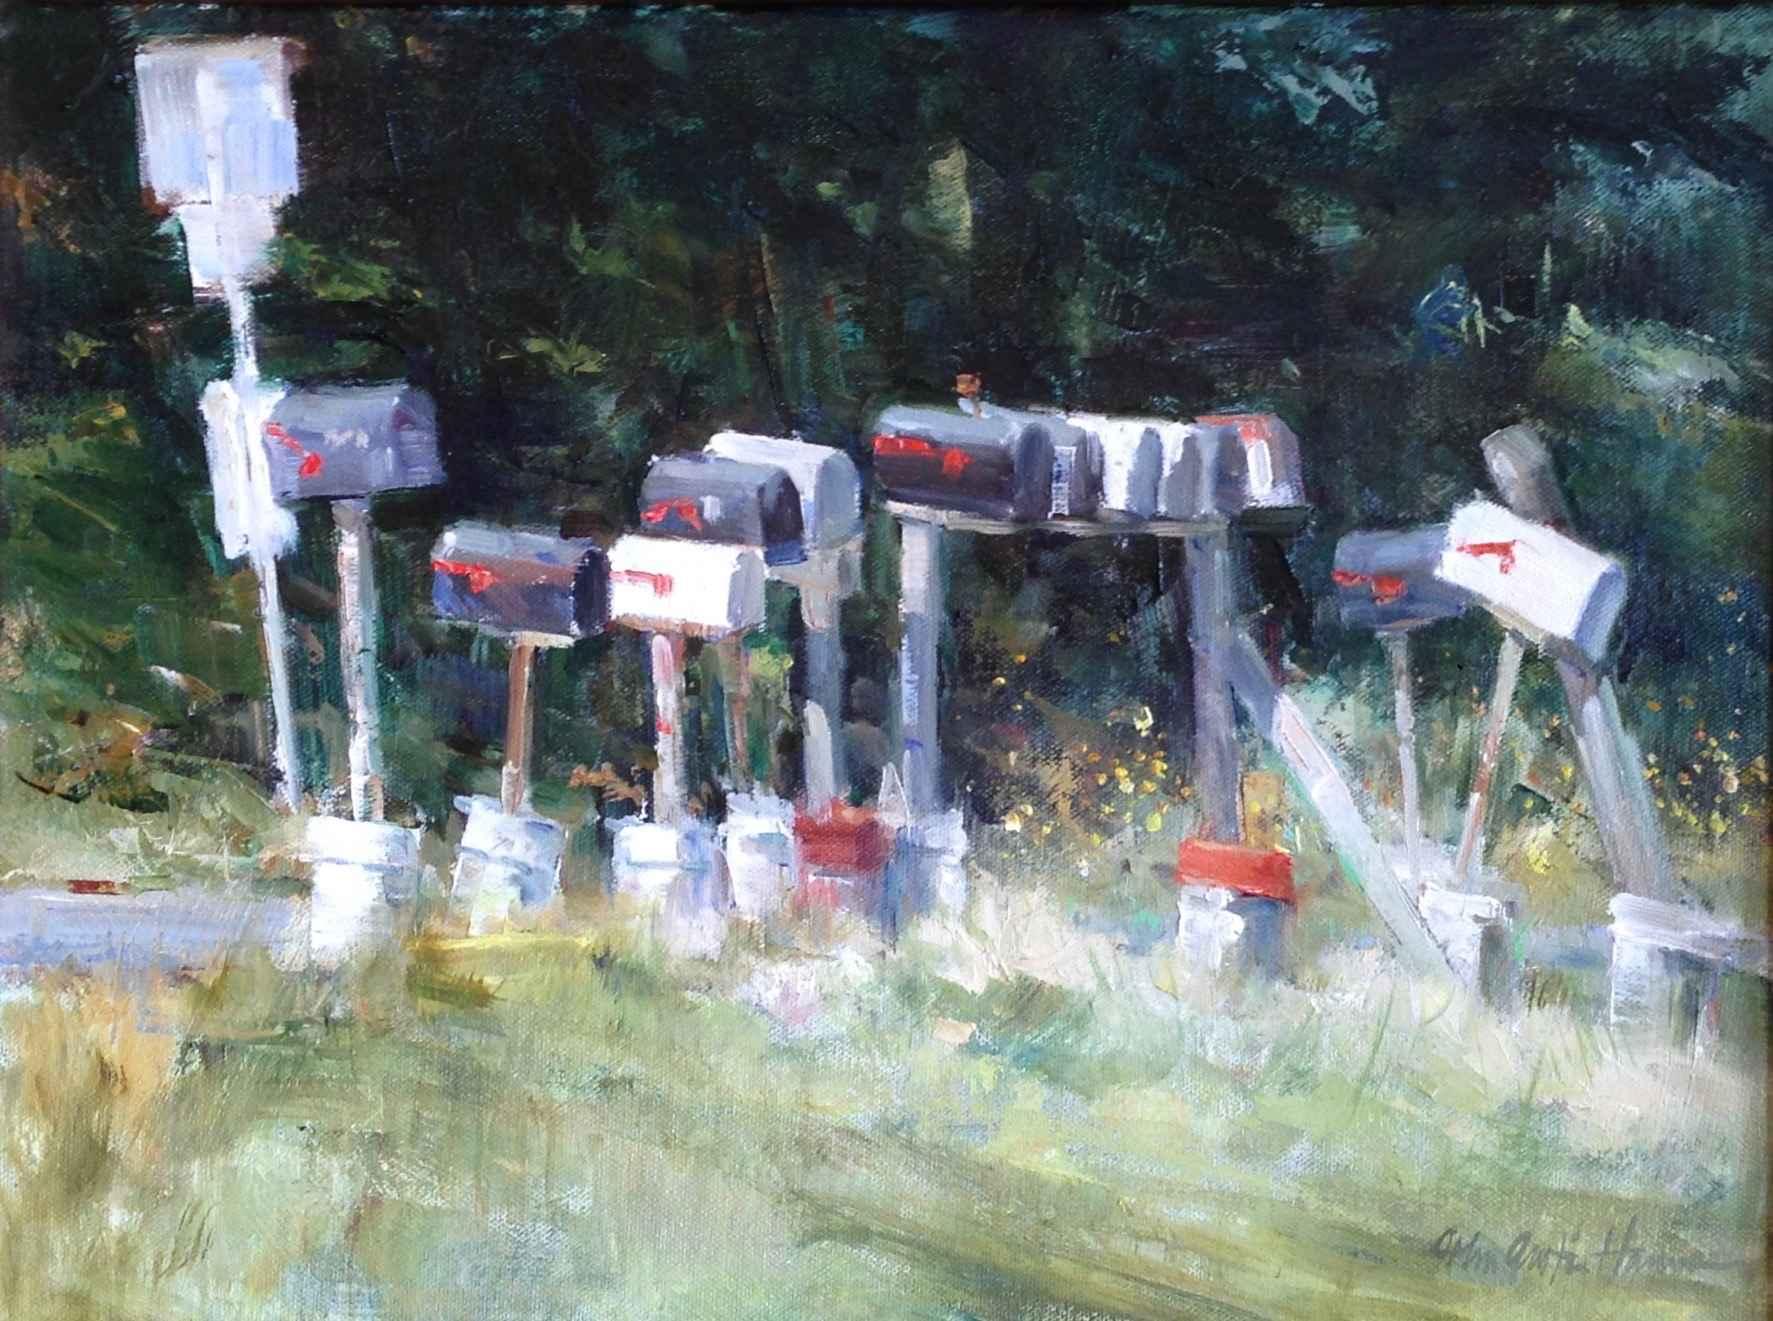 Rural Delivery by  John Austin Hanna - Masterpiece Online